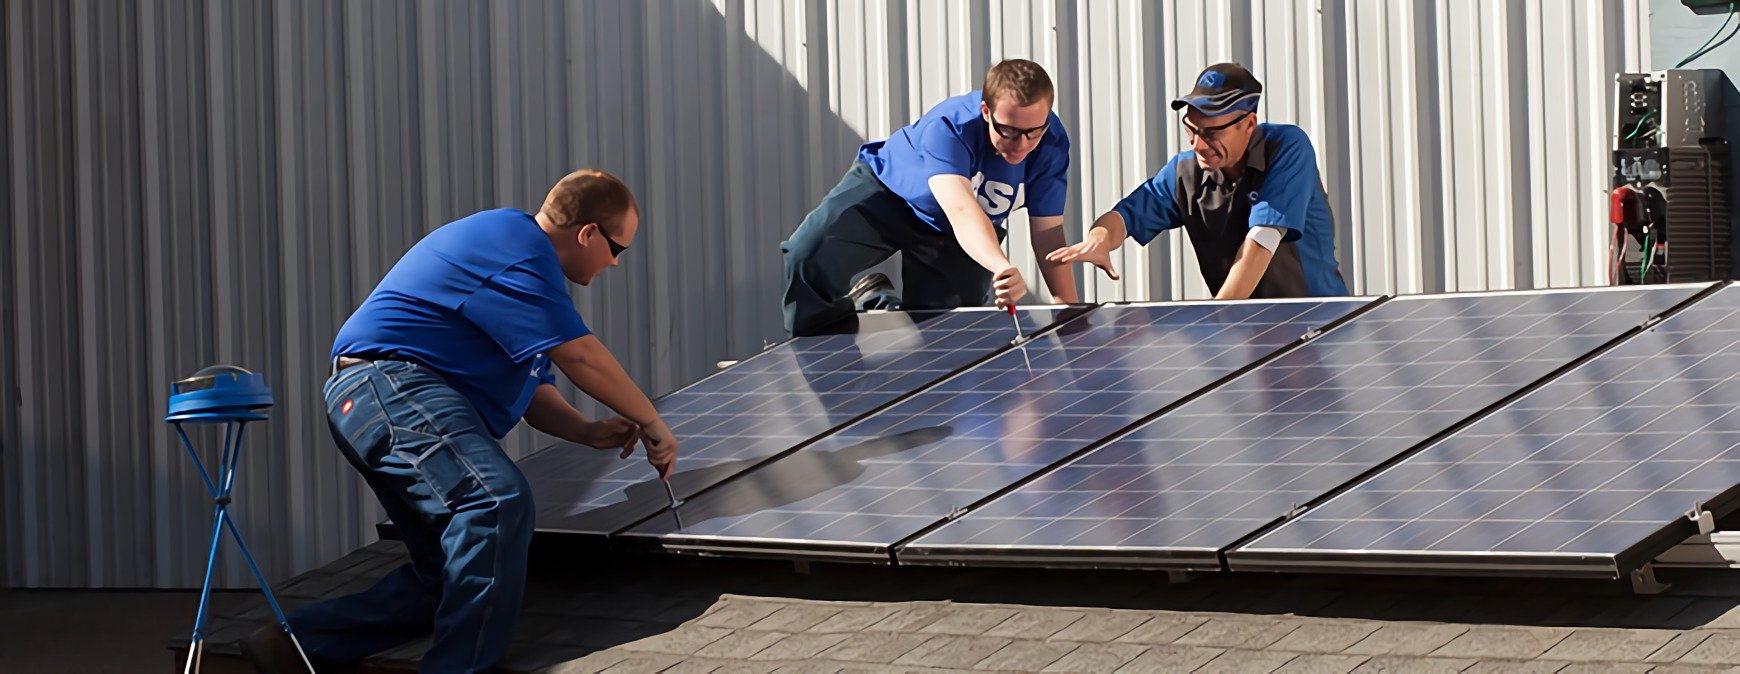 students learning solar installation